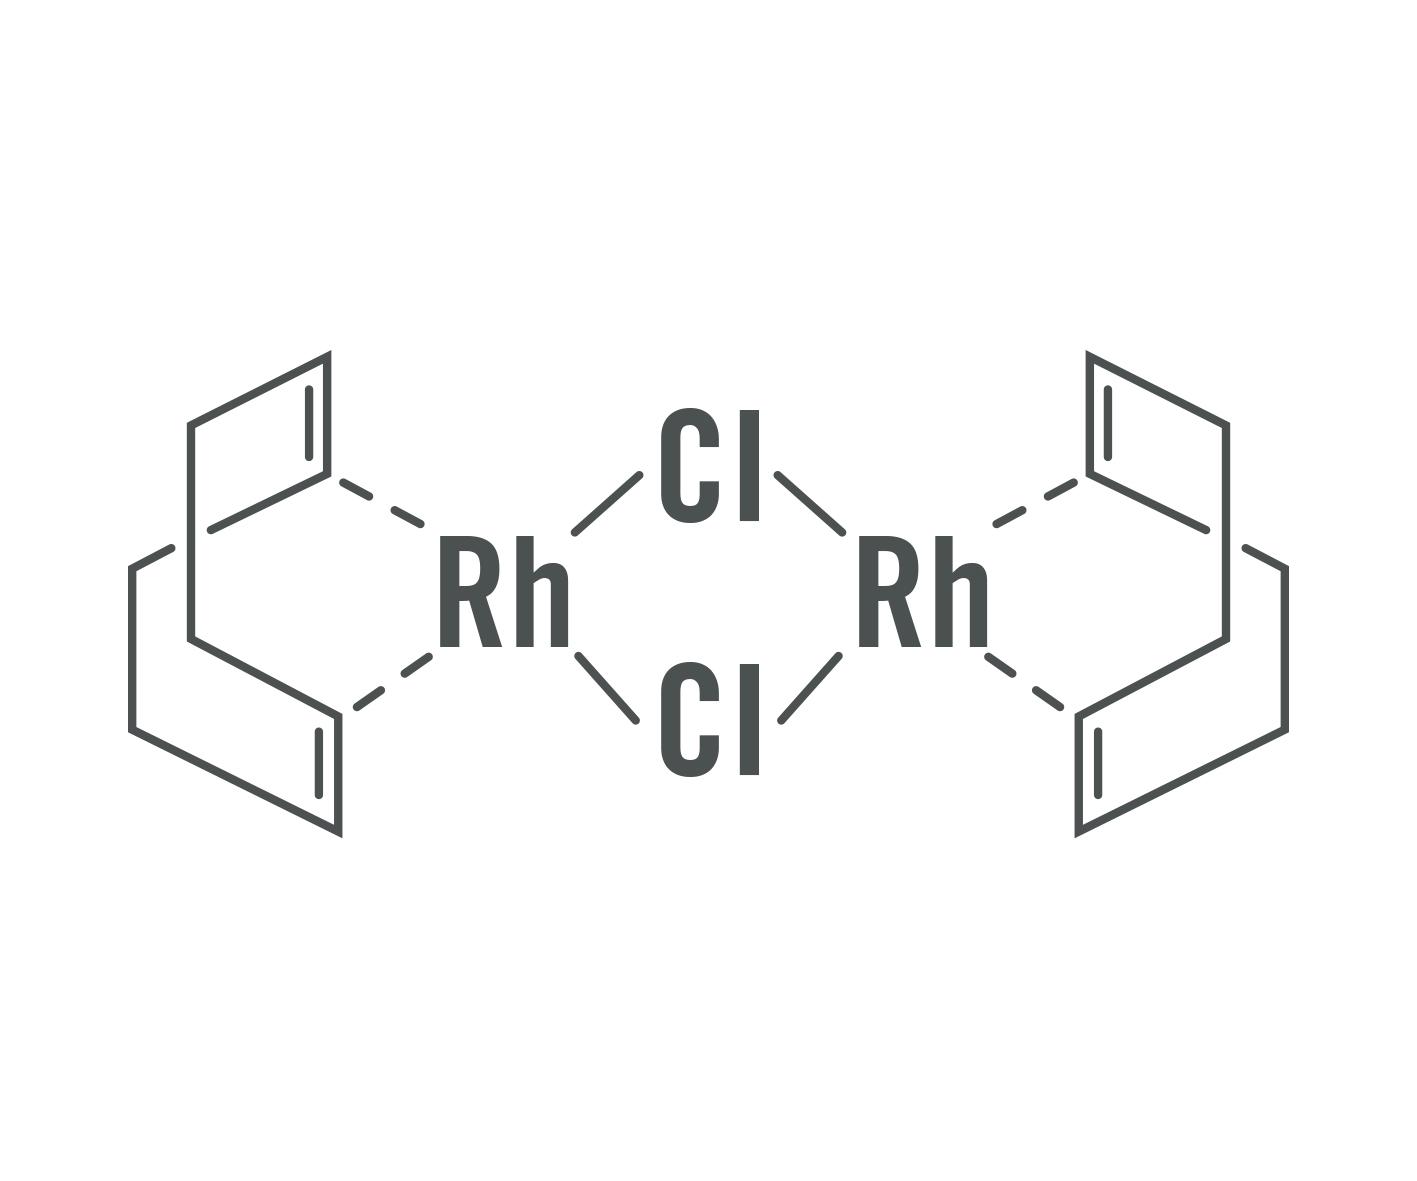 Di-µ-chloro-bis[(cycloocta-1,5-diene)rhodium(I)]